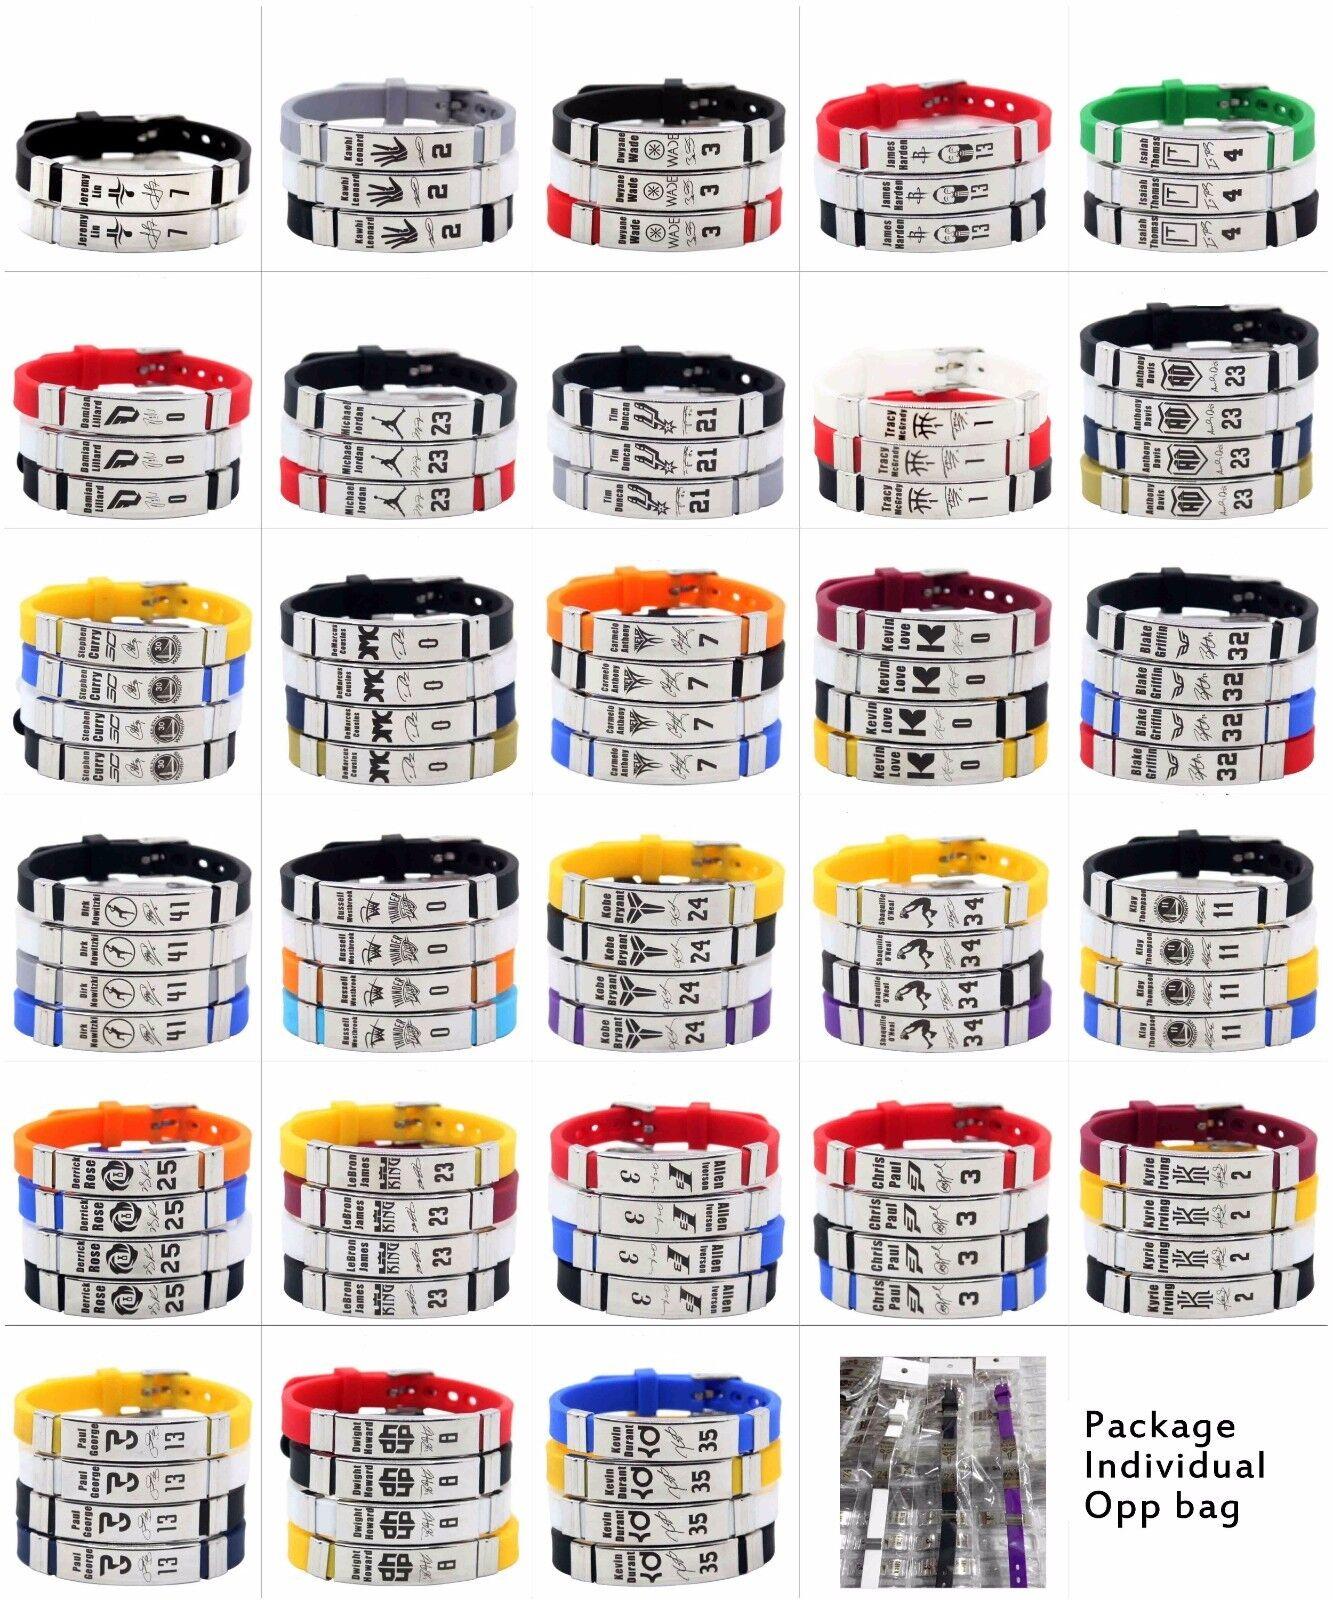 NBA Basketball Bracelet Silicone and Stainless Steel adjustable Wristband 1pcs Seasonal clearance sale